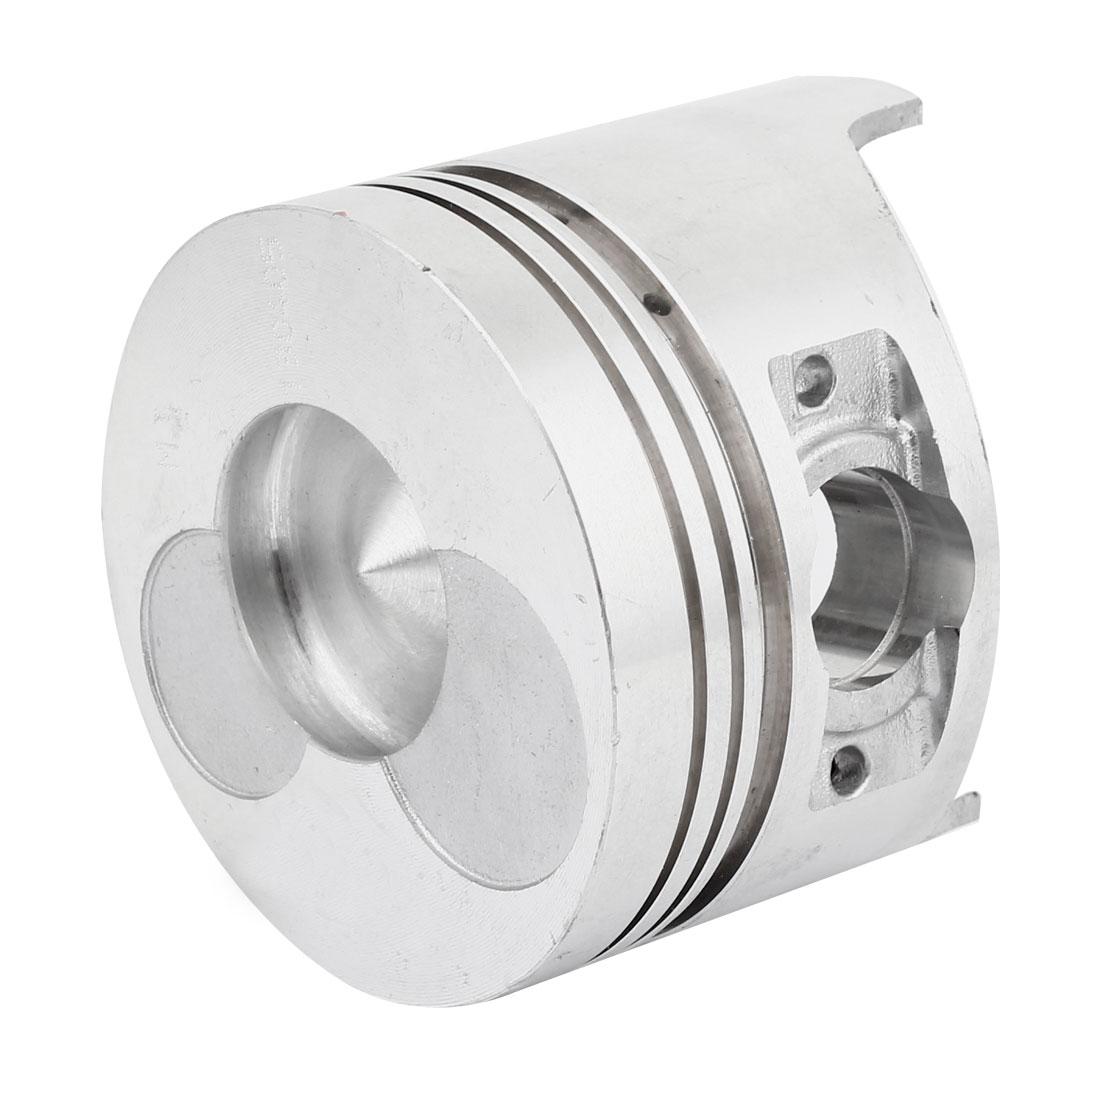 70mm Diameter Silver Tone Air Compressor Generator Mower Engine Motor Piston